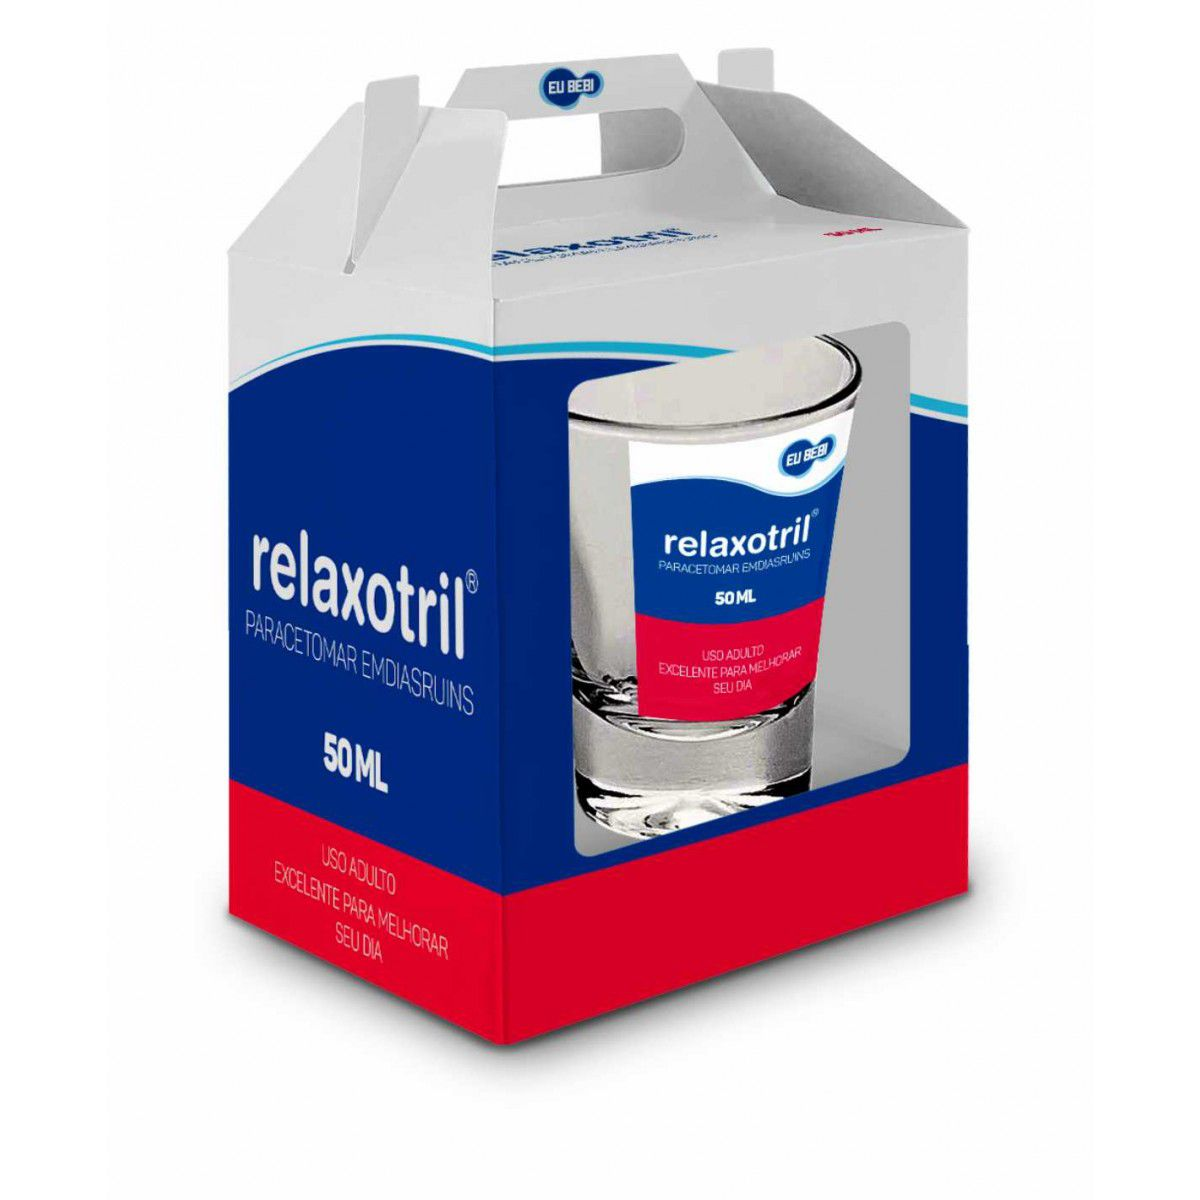 Copo Dose Individual Remédio Relaxotril